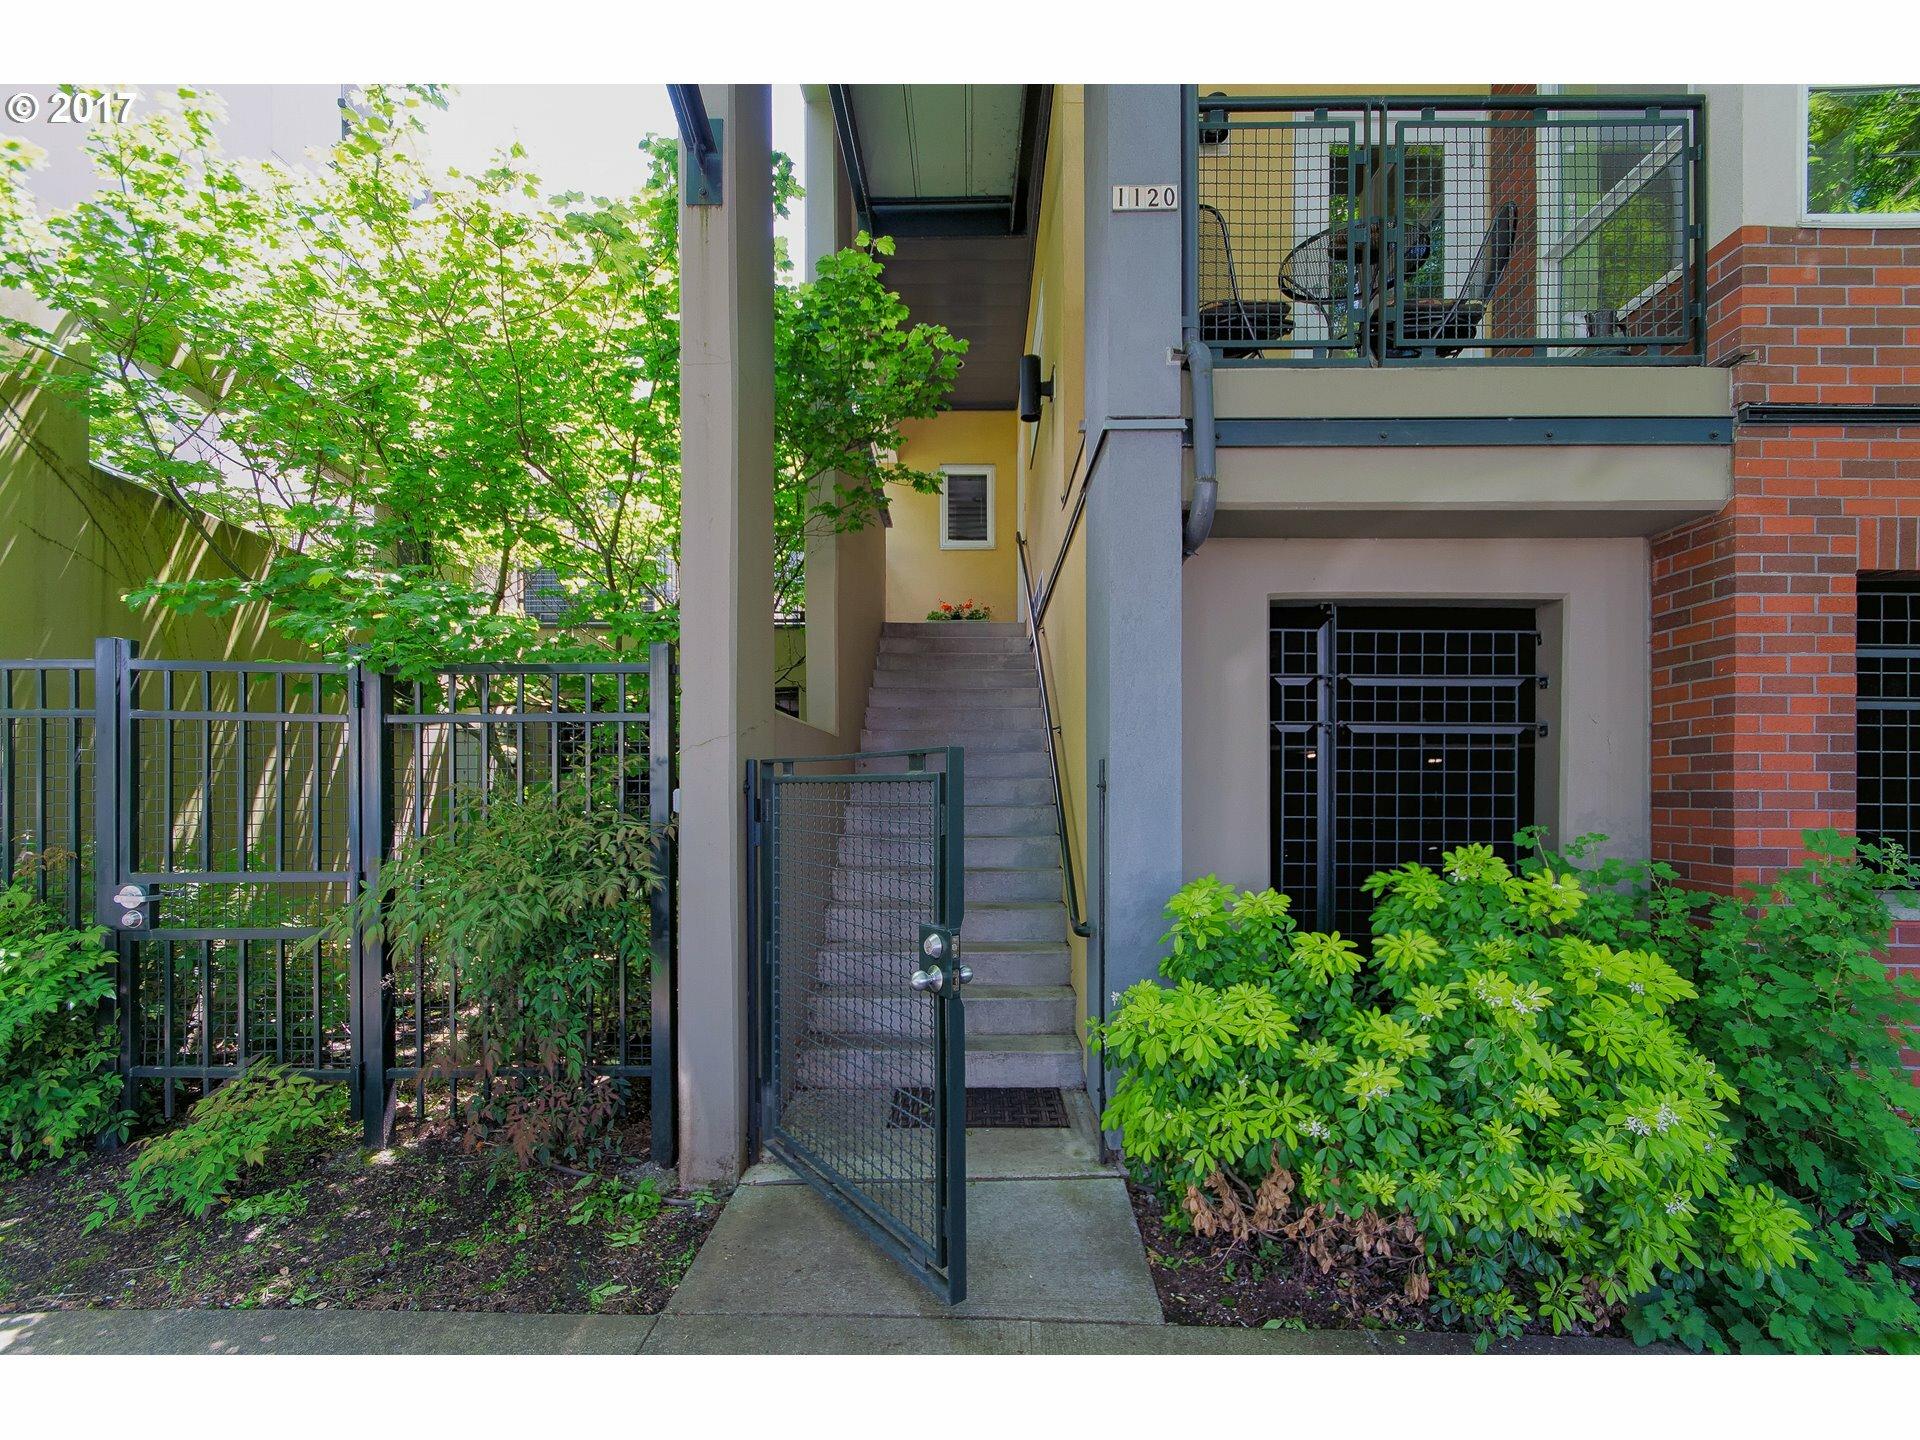 1120 Ne Schuyler St 104, Portland, OR - USA (photo 1)